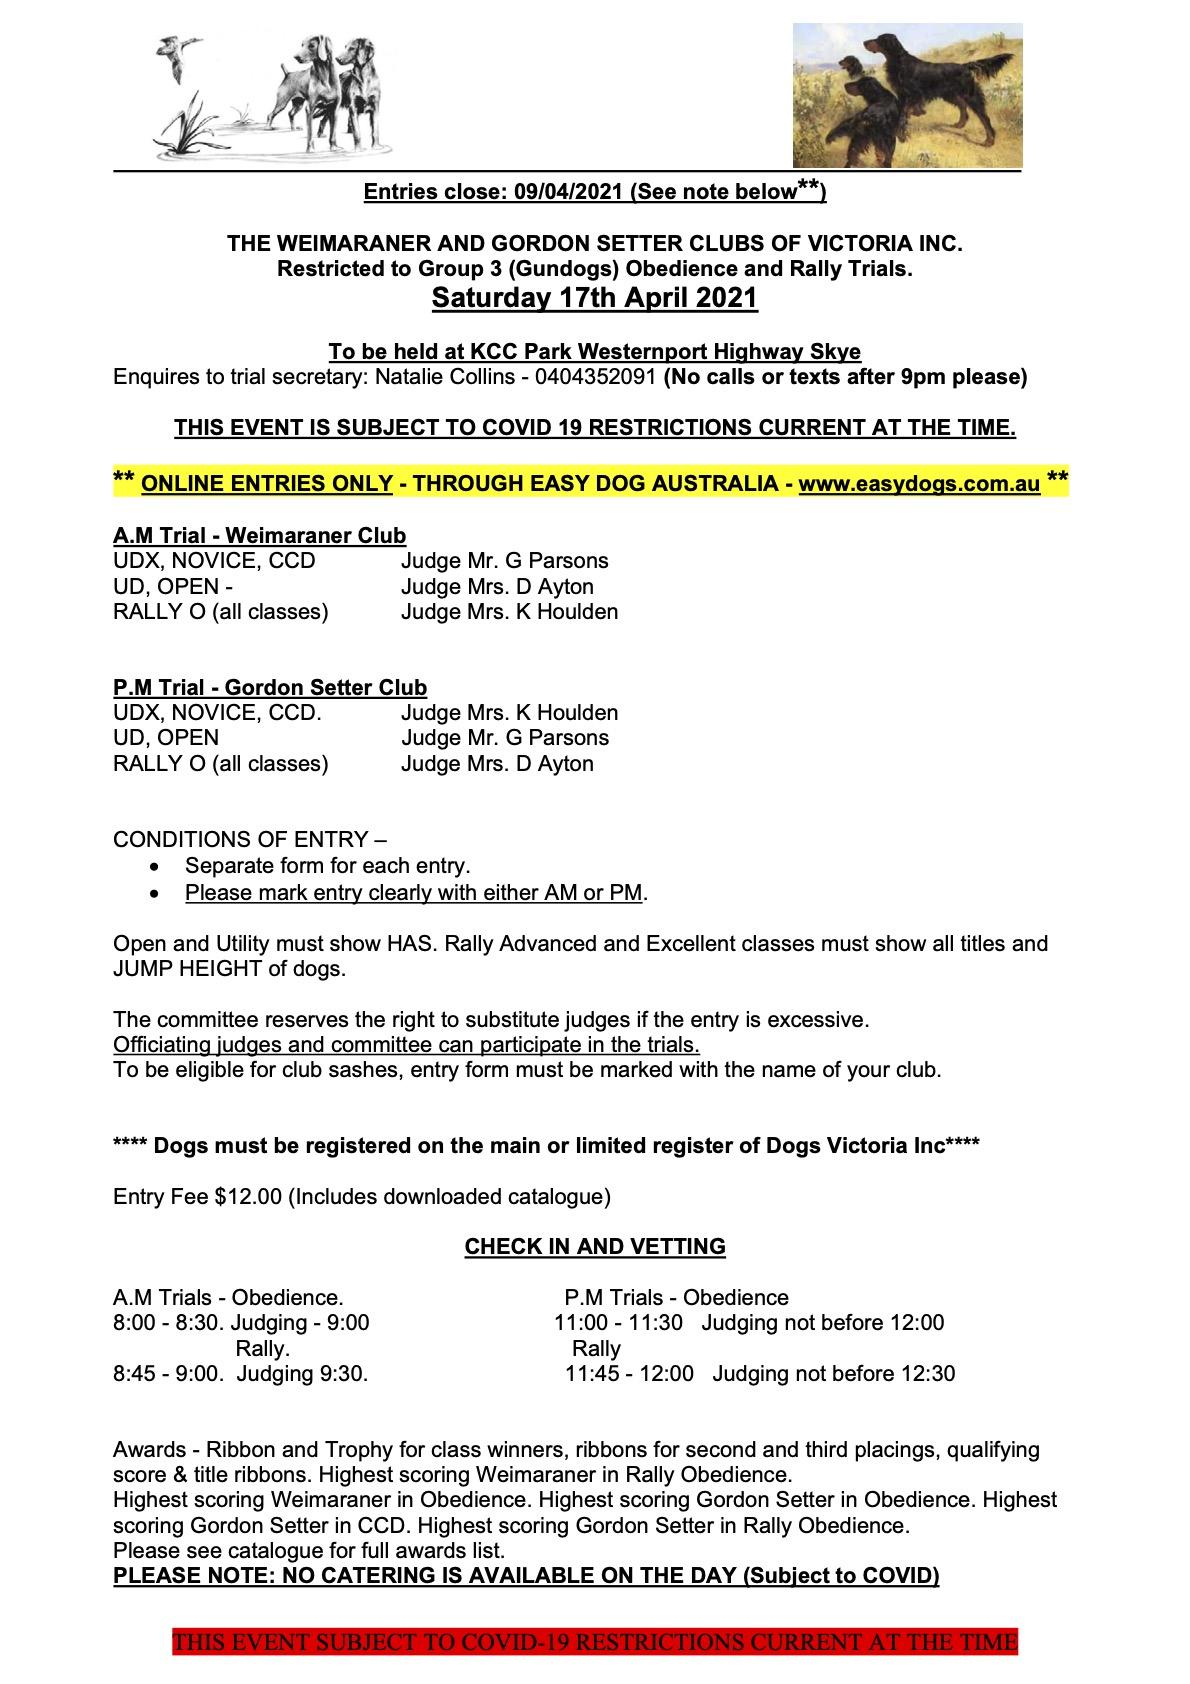 2021 Obedience 29269-SCHEDULE-Weimaraner-Club-of-Victoria-Inc-(AM-Trial)-(VIC)-V1